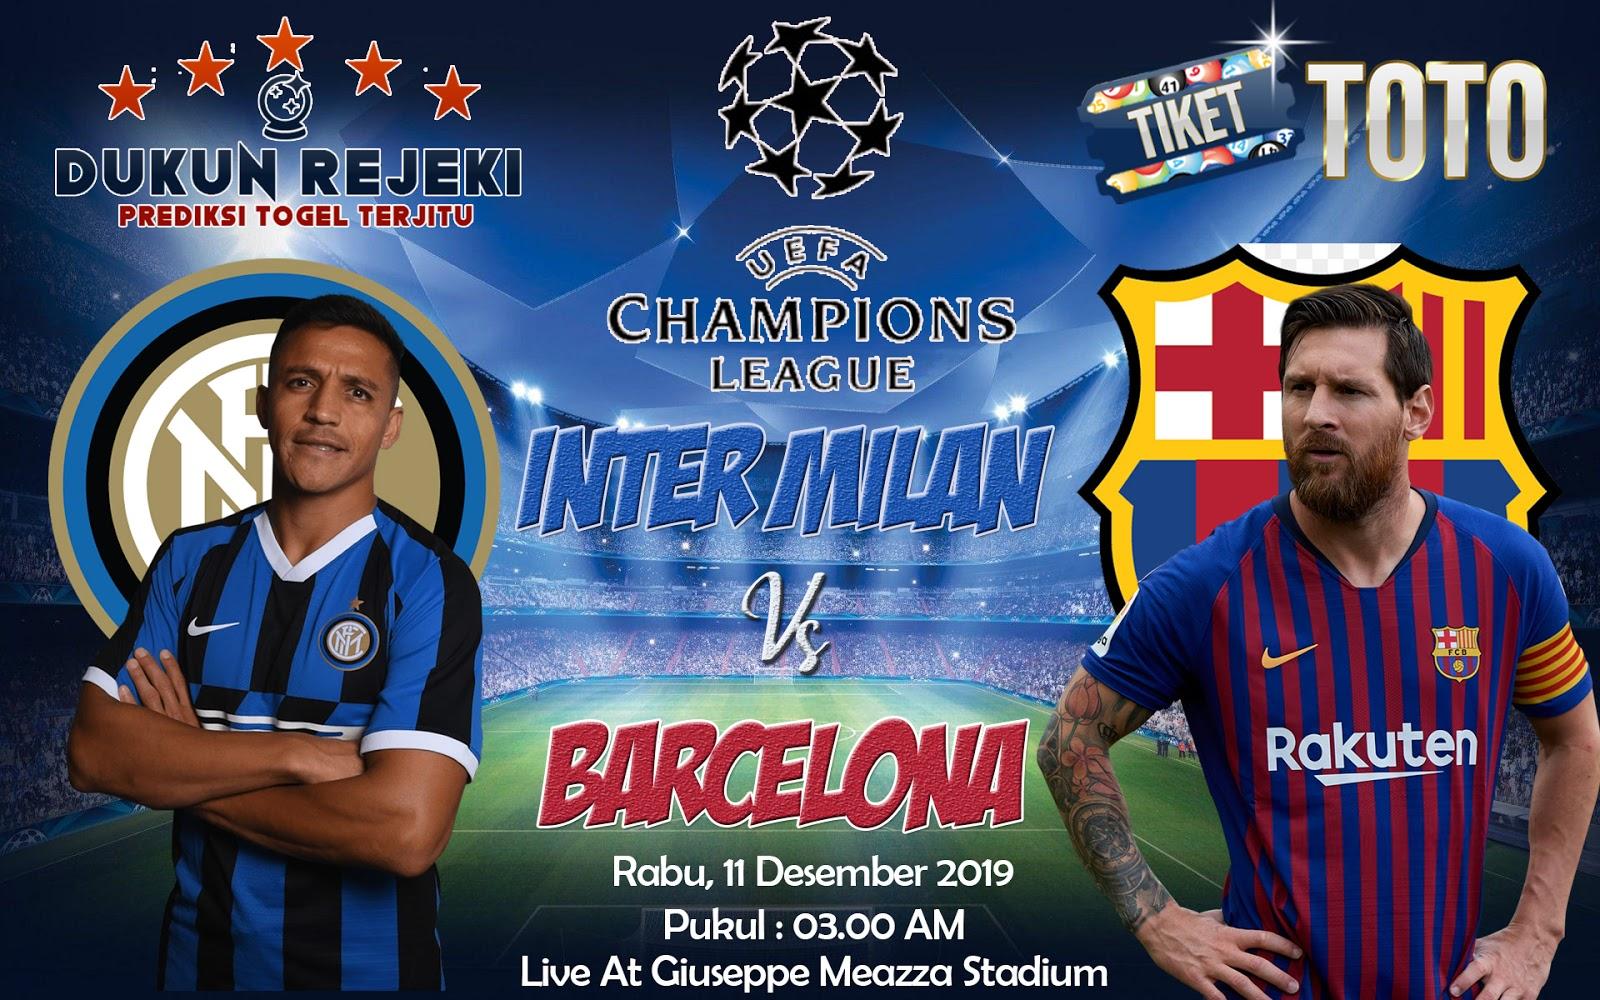 Prediksi Inter Milan vs Barcelona 11 Desember 2019 Champions League